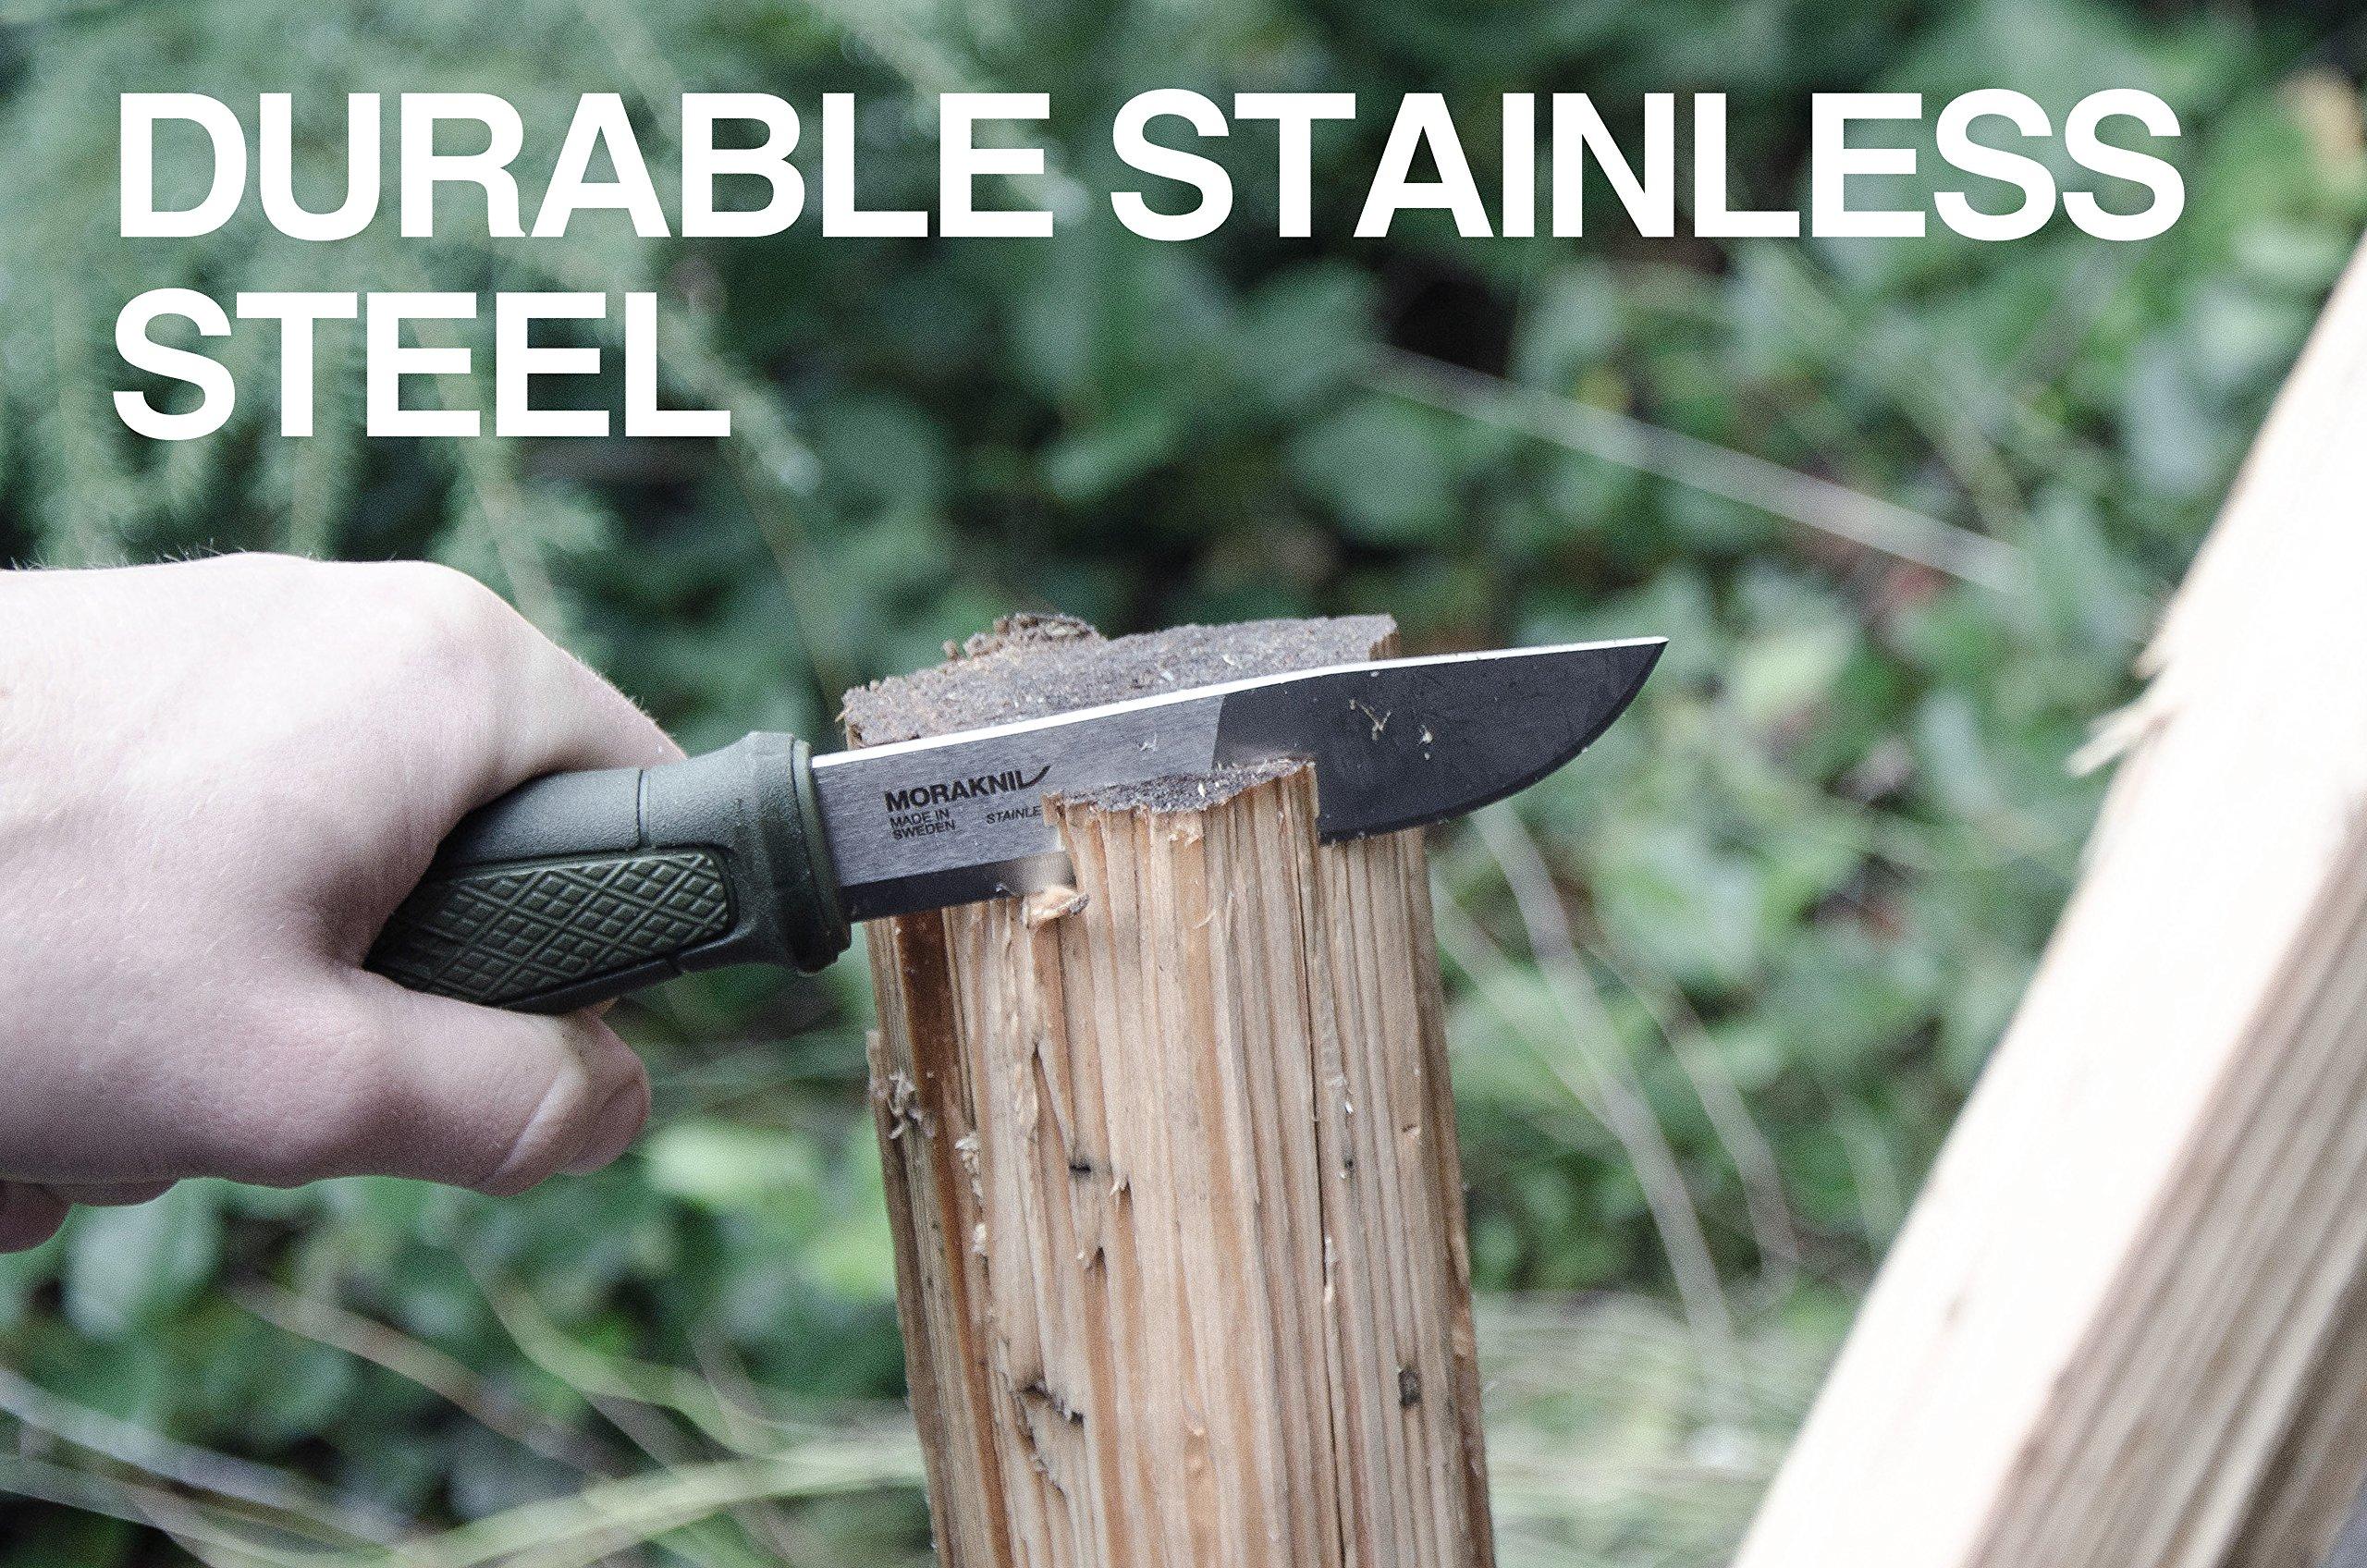 Morakniv Kansbol Fixed Blade Knife with Sandvik Stainless Steel Blade and Plastic Sheath, 4.3-Inch by Morakniv (Image #5)